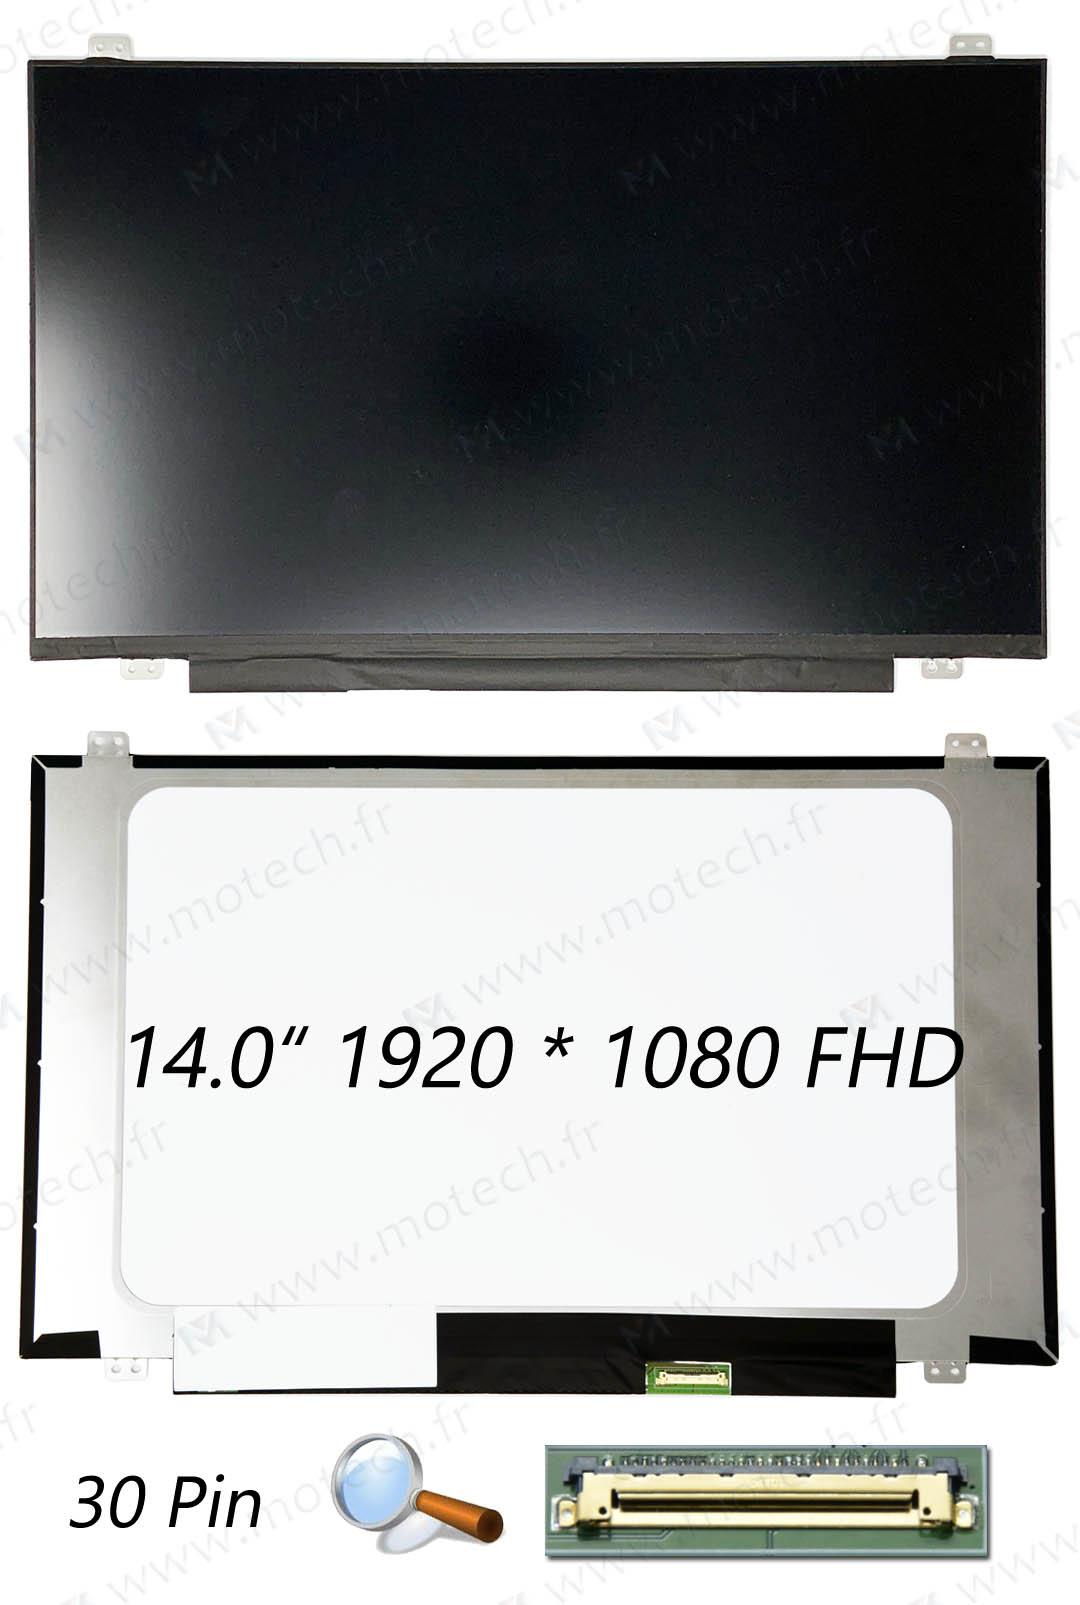 Huawei Series 14 MateBook D KPL-W00 screen, Huawei Series 14 MateBook D KPL-W00 display, Huawei Series 14 MateBook D KPL-W00 LCD, Huawei Series 14 MateBook D KPL-W00 LCD Display,